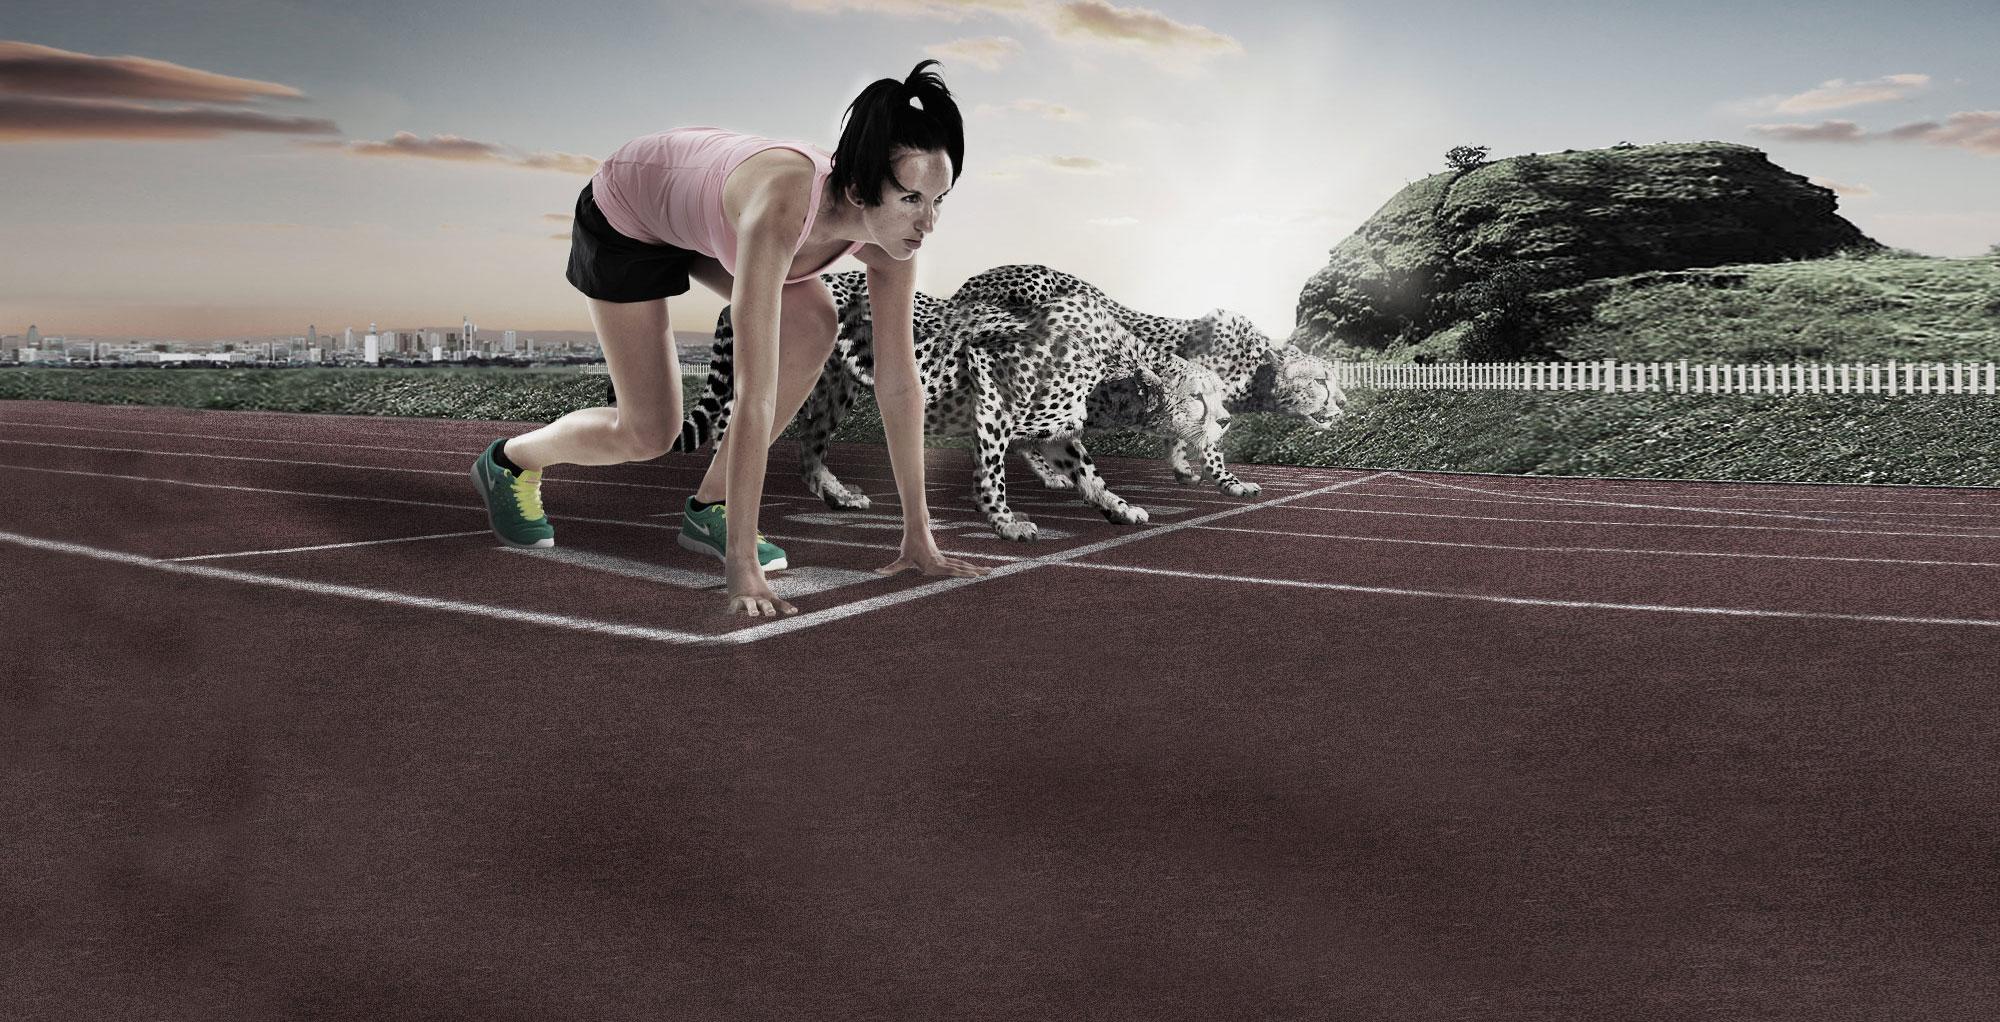 man-cheetah-running_f